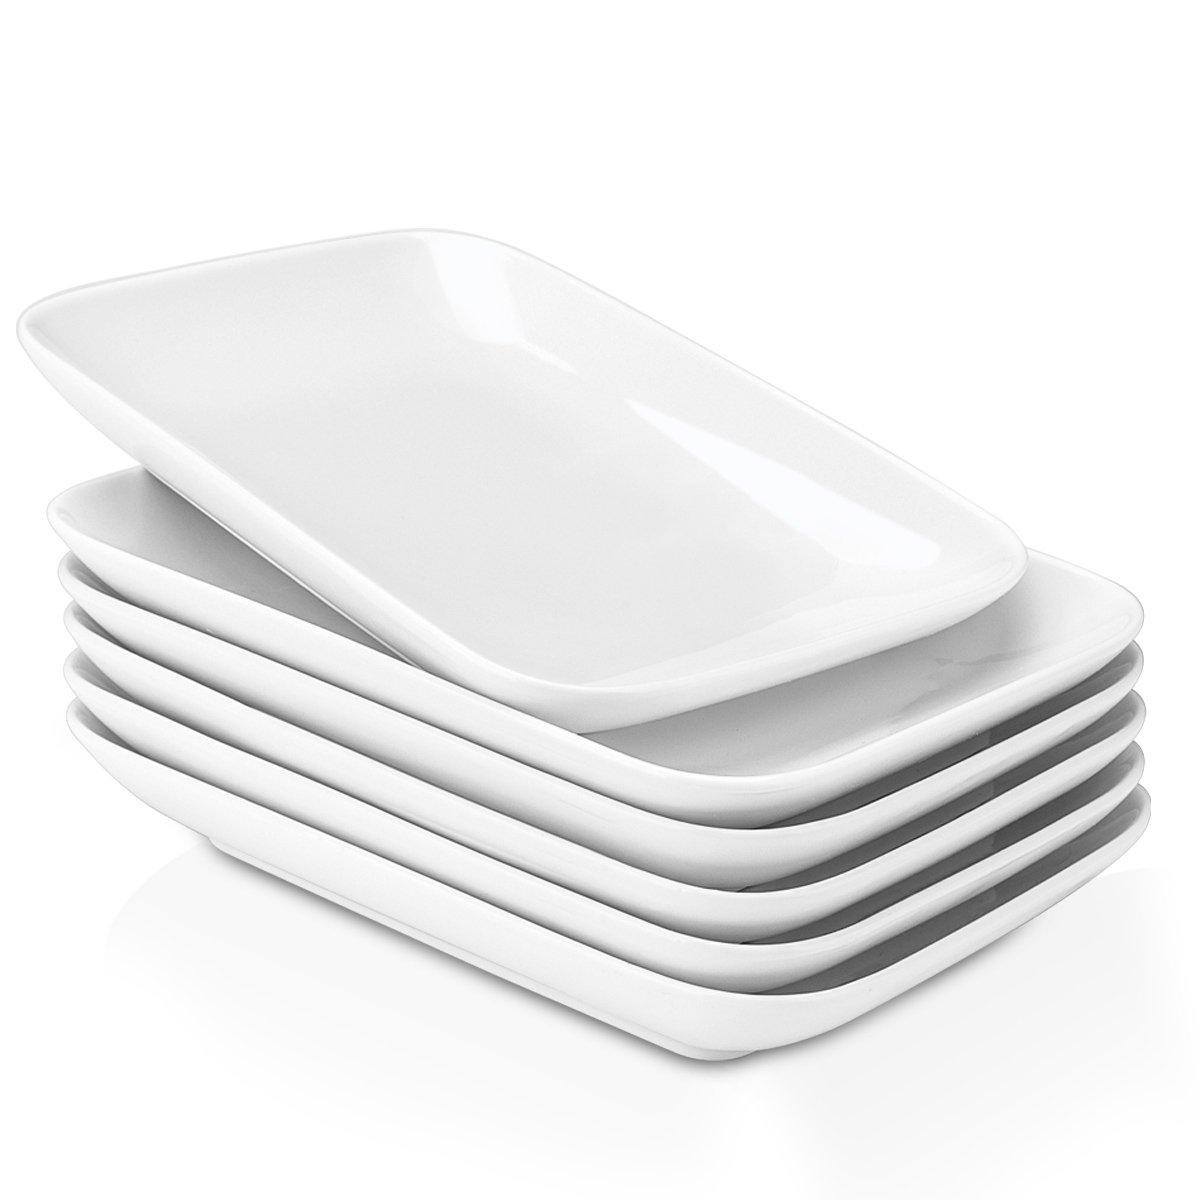 Delling 8 in Ultralight Ceramic Dessert/Appetizer Plates, Rectangular Salad Plates for Fruit, Cheese, Dessert, Lunch and More - Set of 6, White